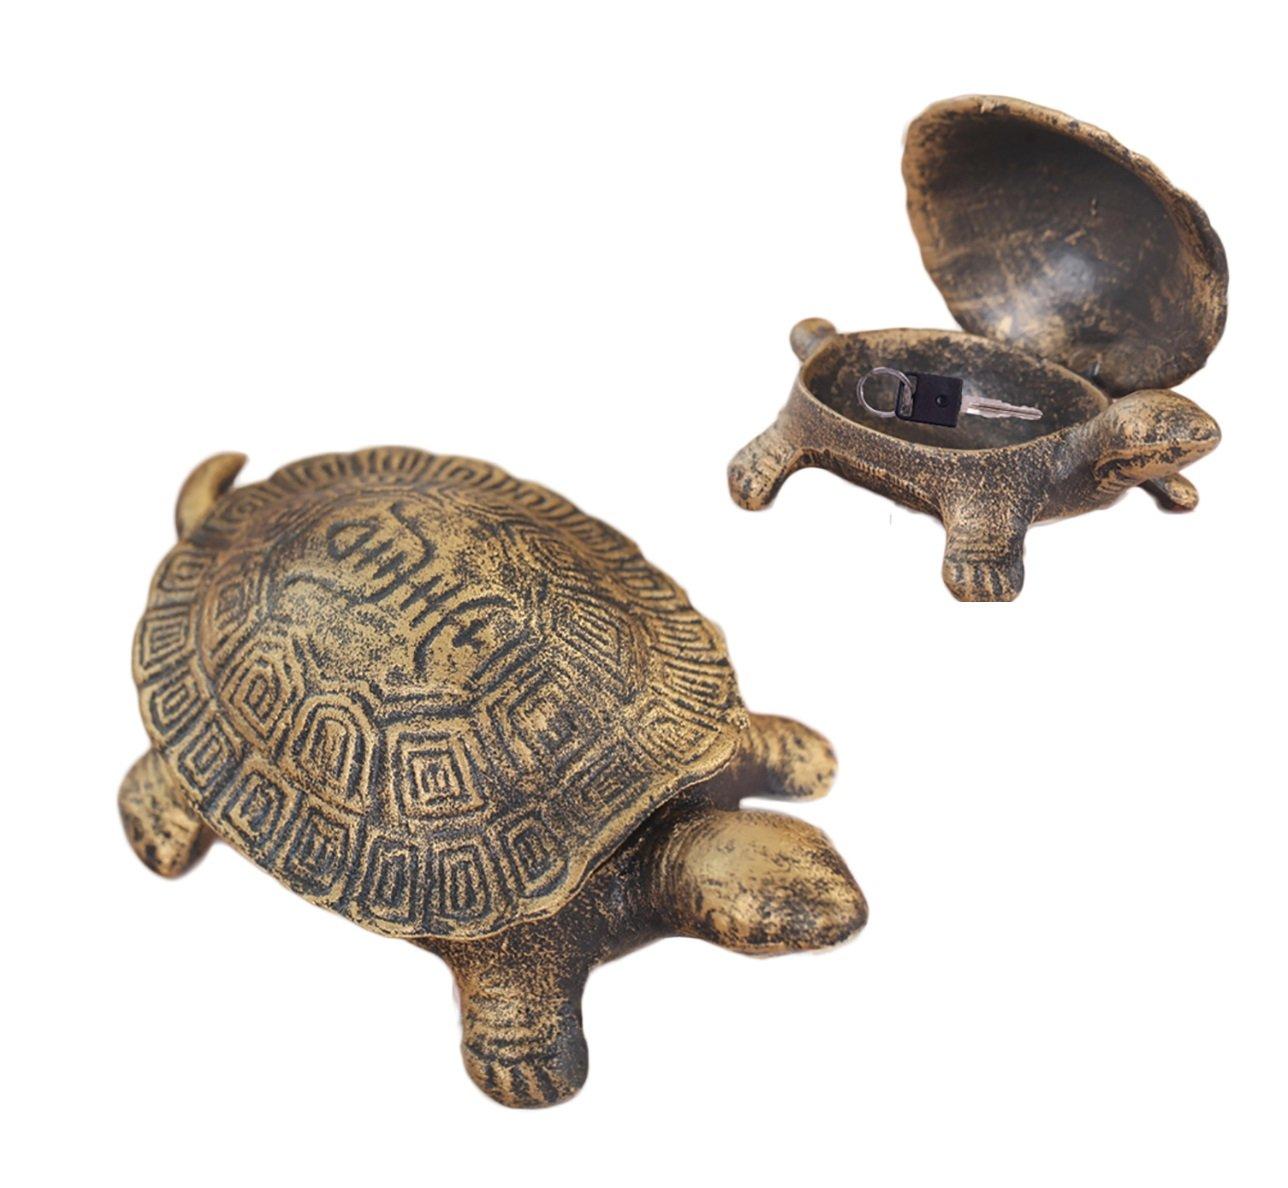 Greekアートガーデン装飾Turtle Cast IronキーセーフキーHiderストーンDiversion外側Hider hide-a-keyホルダー安全にスペアキー非表示に屋外の庭やYard , Geocaching S B0788FJBZQ Turtle B Turtle B